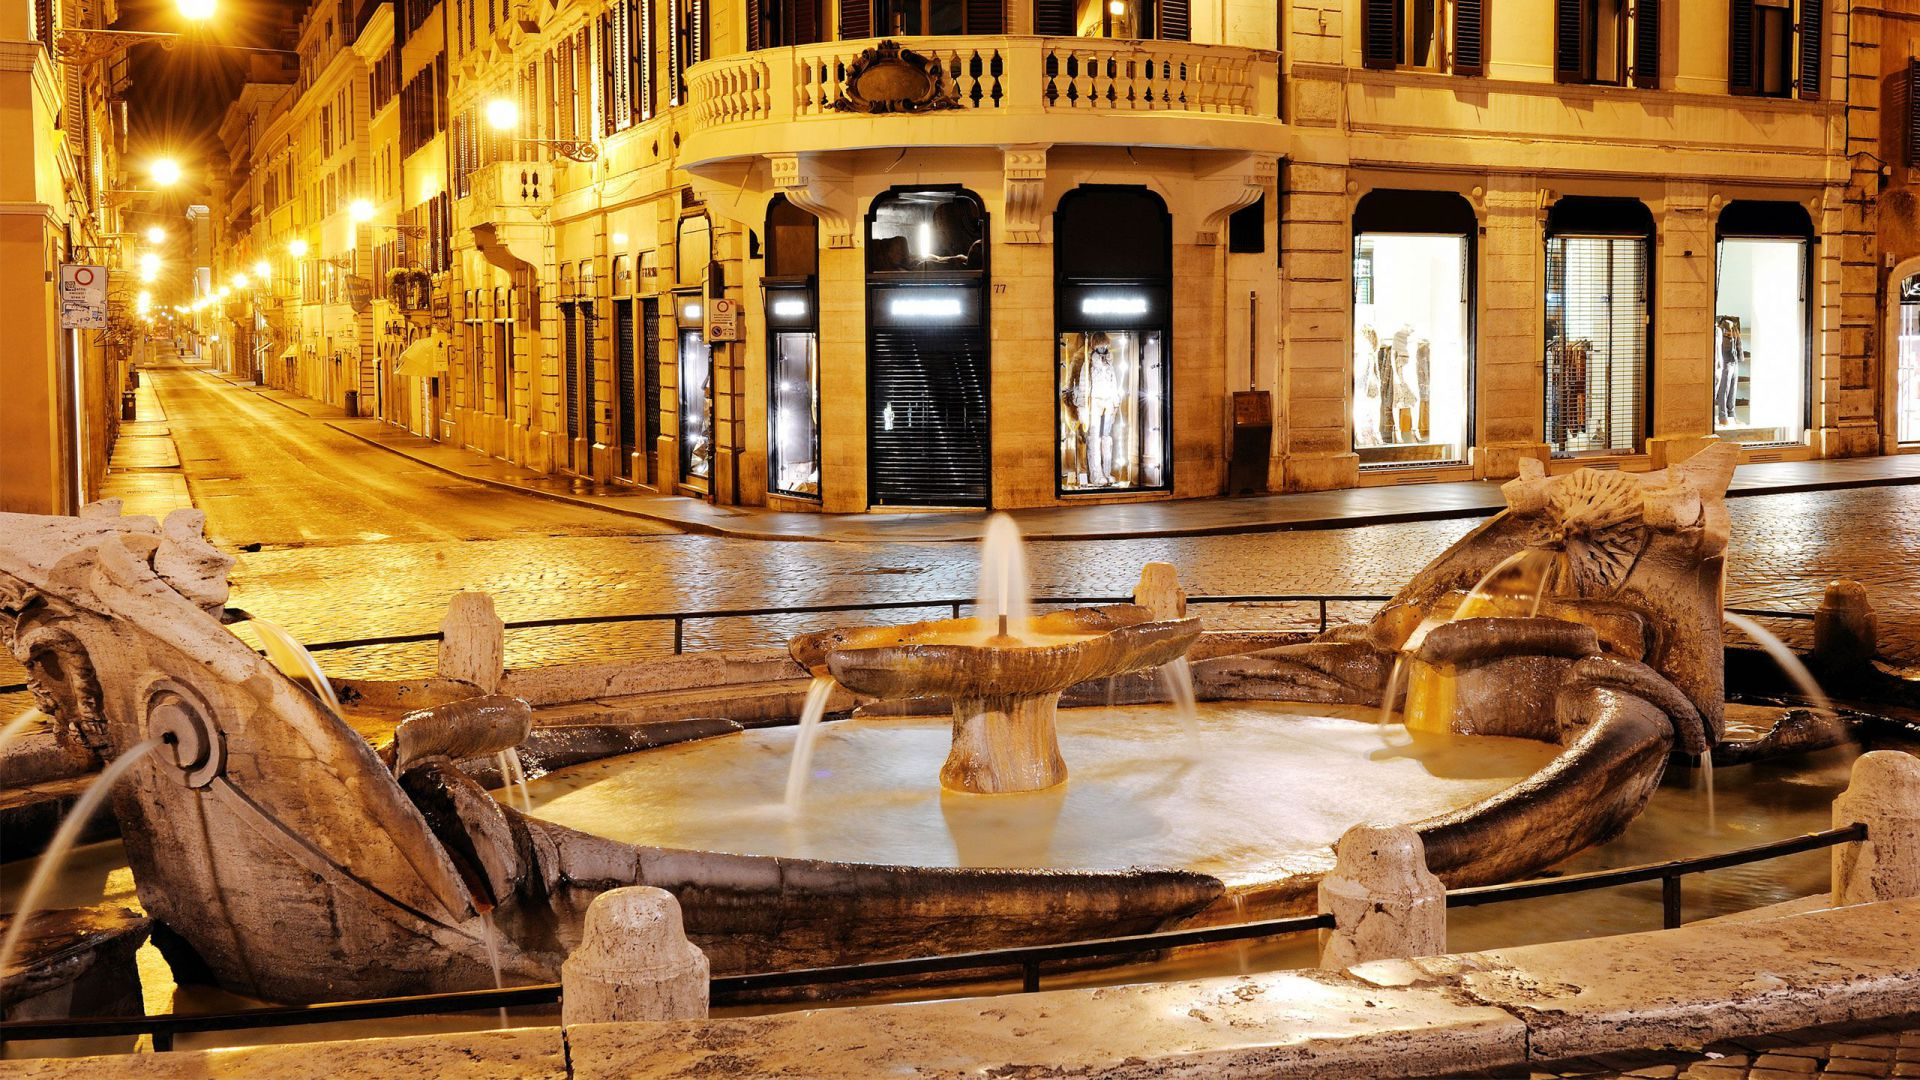 gigli-d-oro-suite-rom-piazza-di-spagna